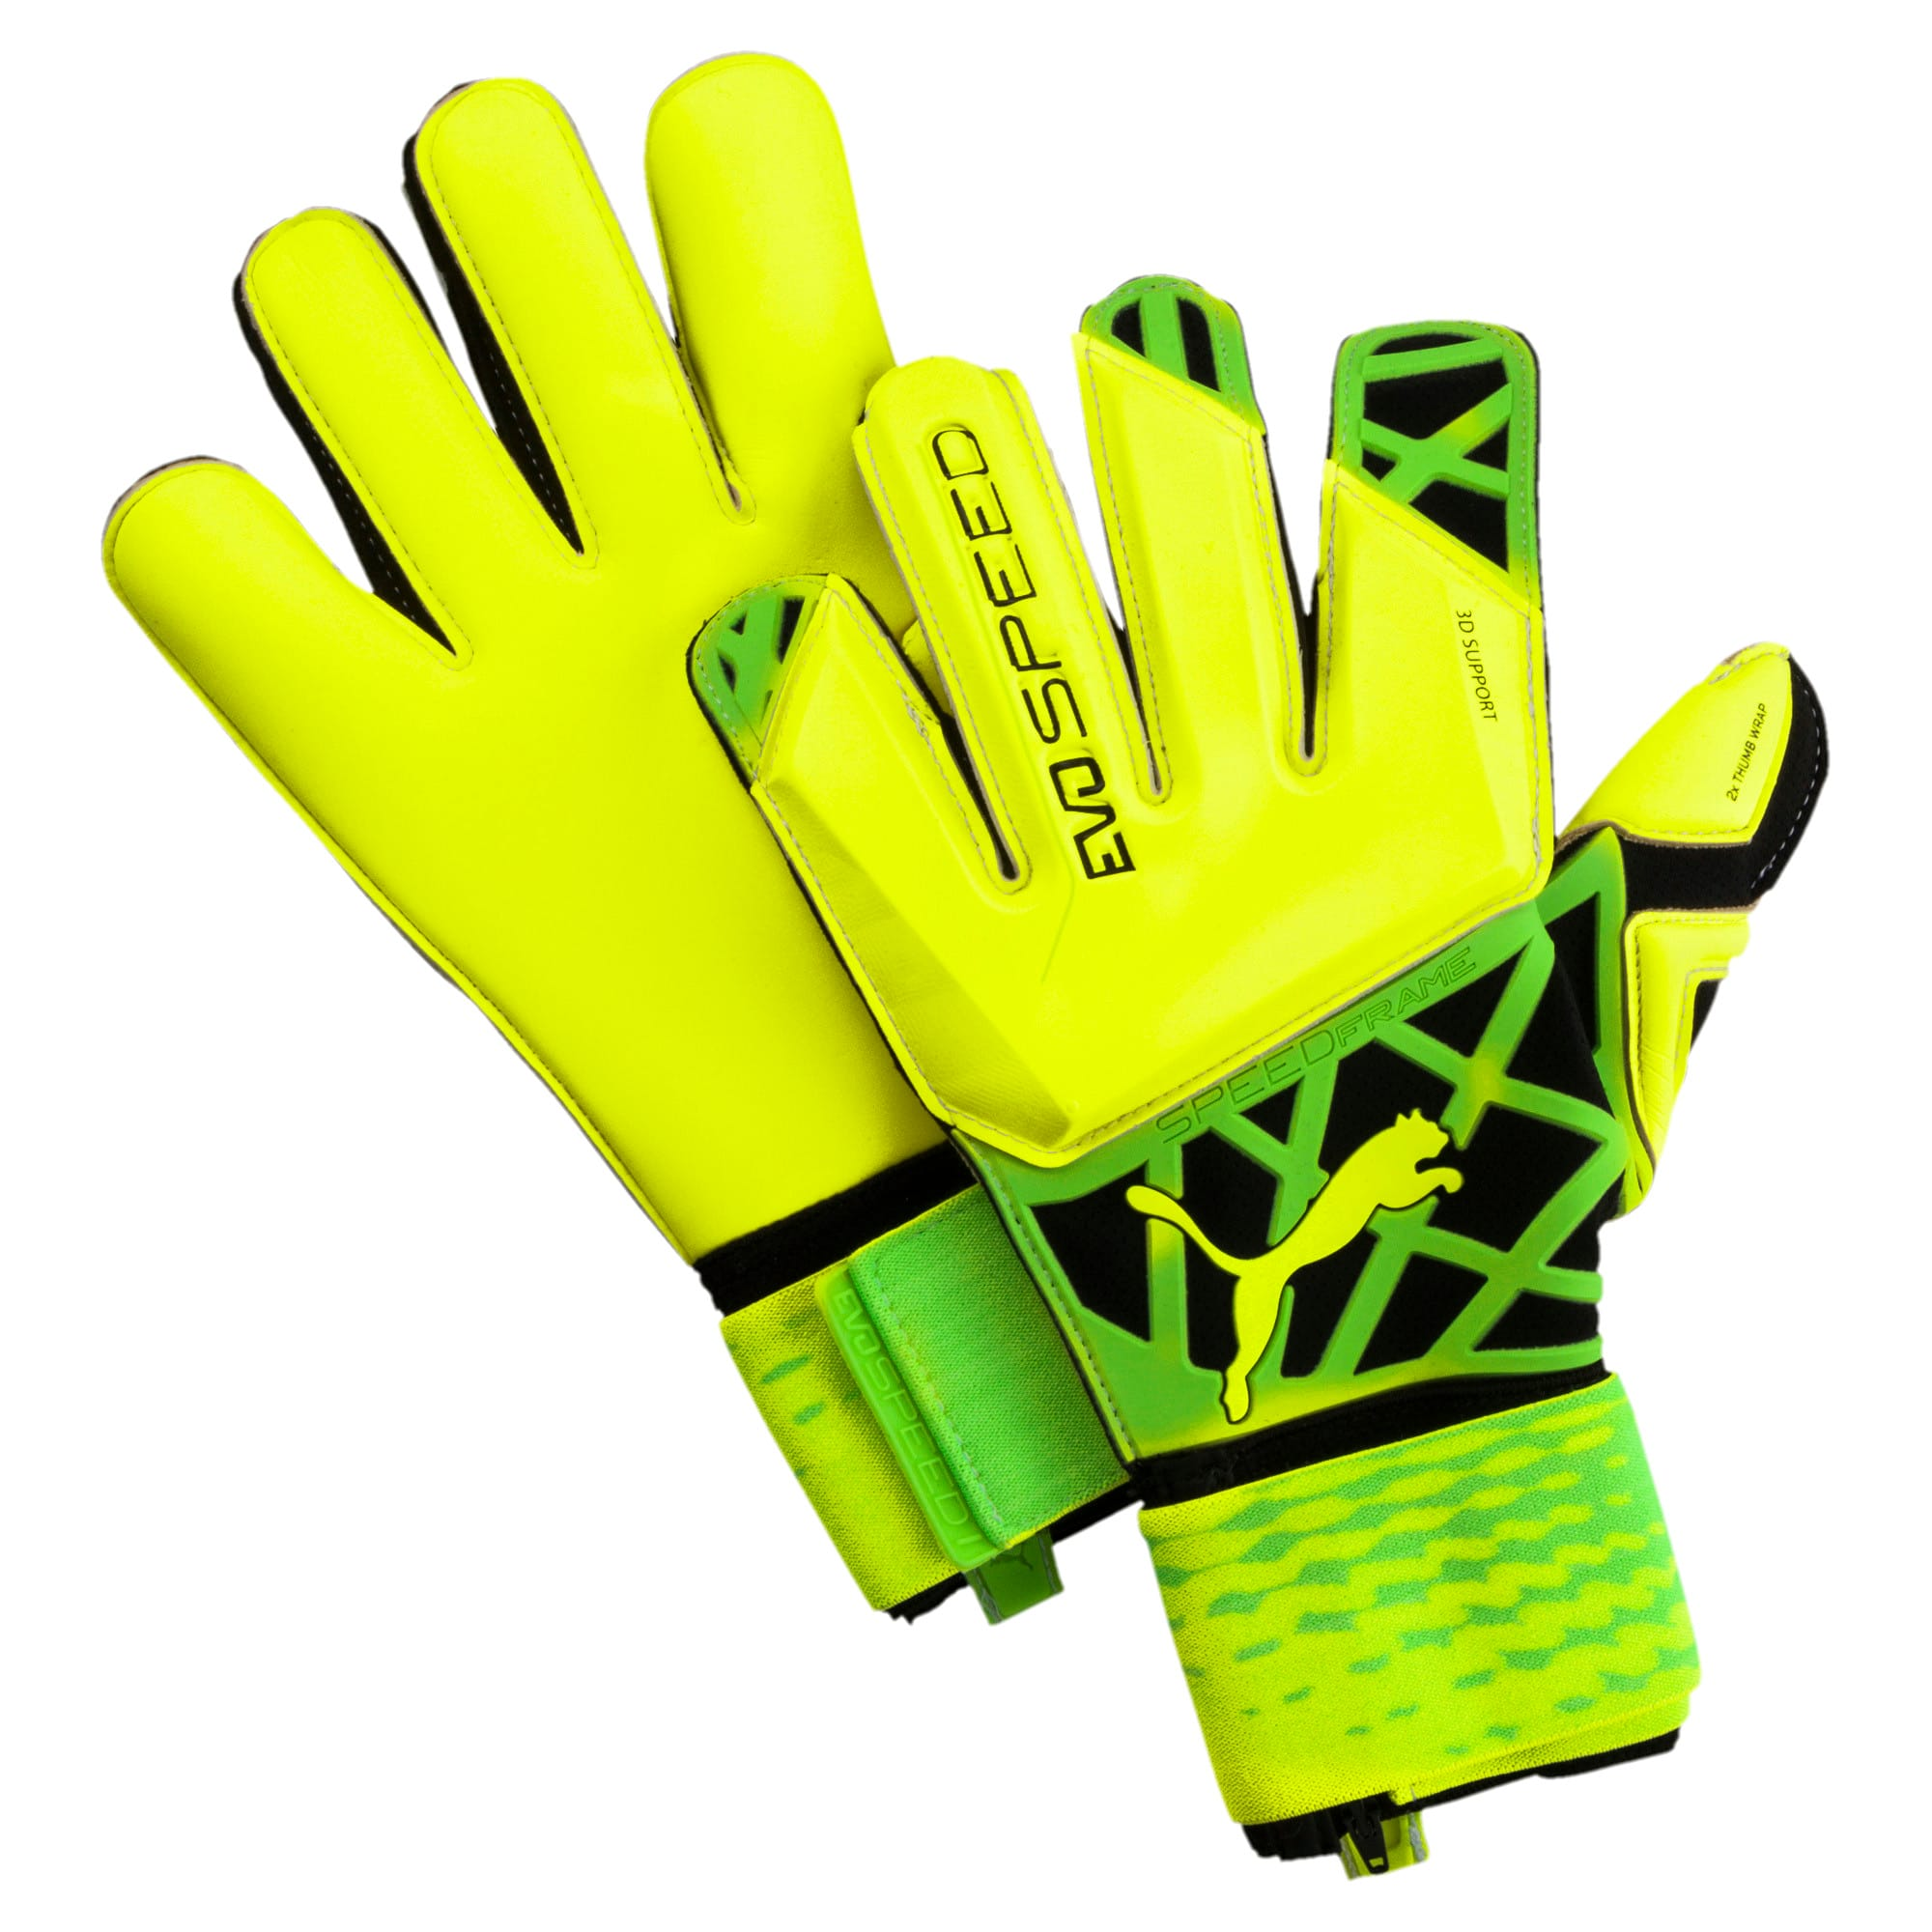 Thumbnail 1 of evoSPEED 1.5 Football Goalie's Gloves, Safety Yellow-Green-Black, medium-IND